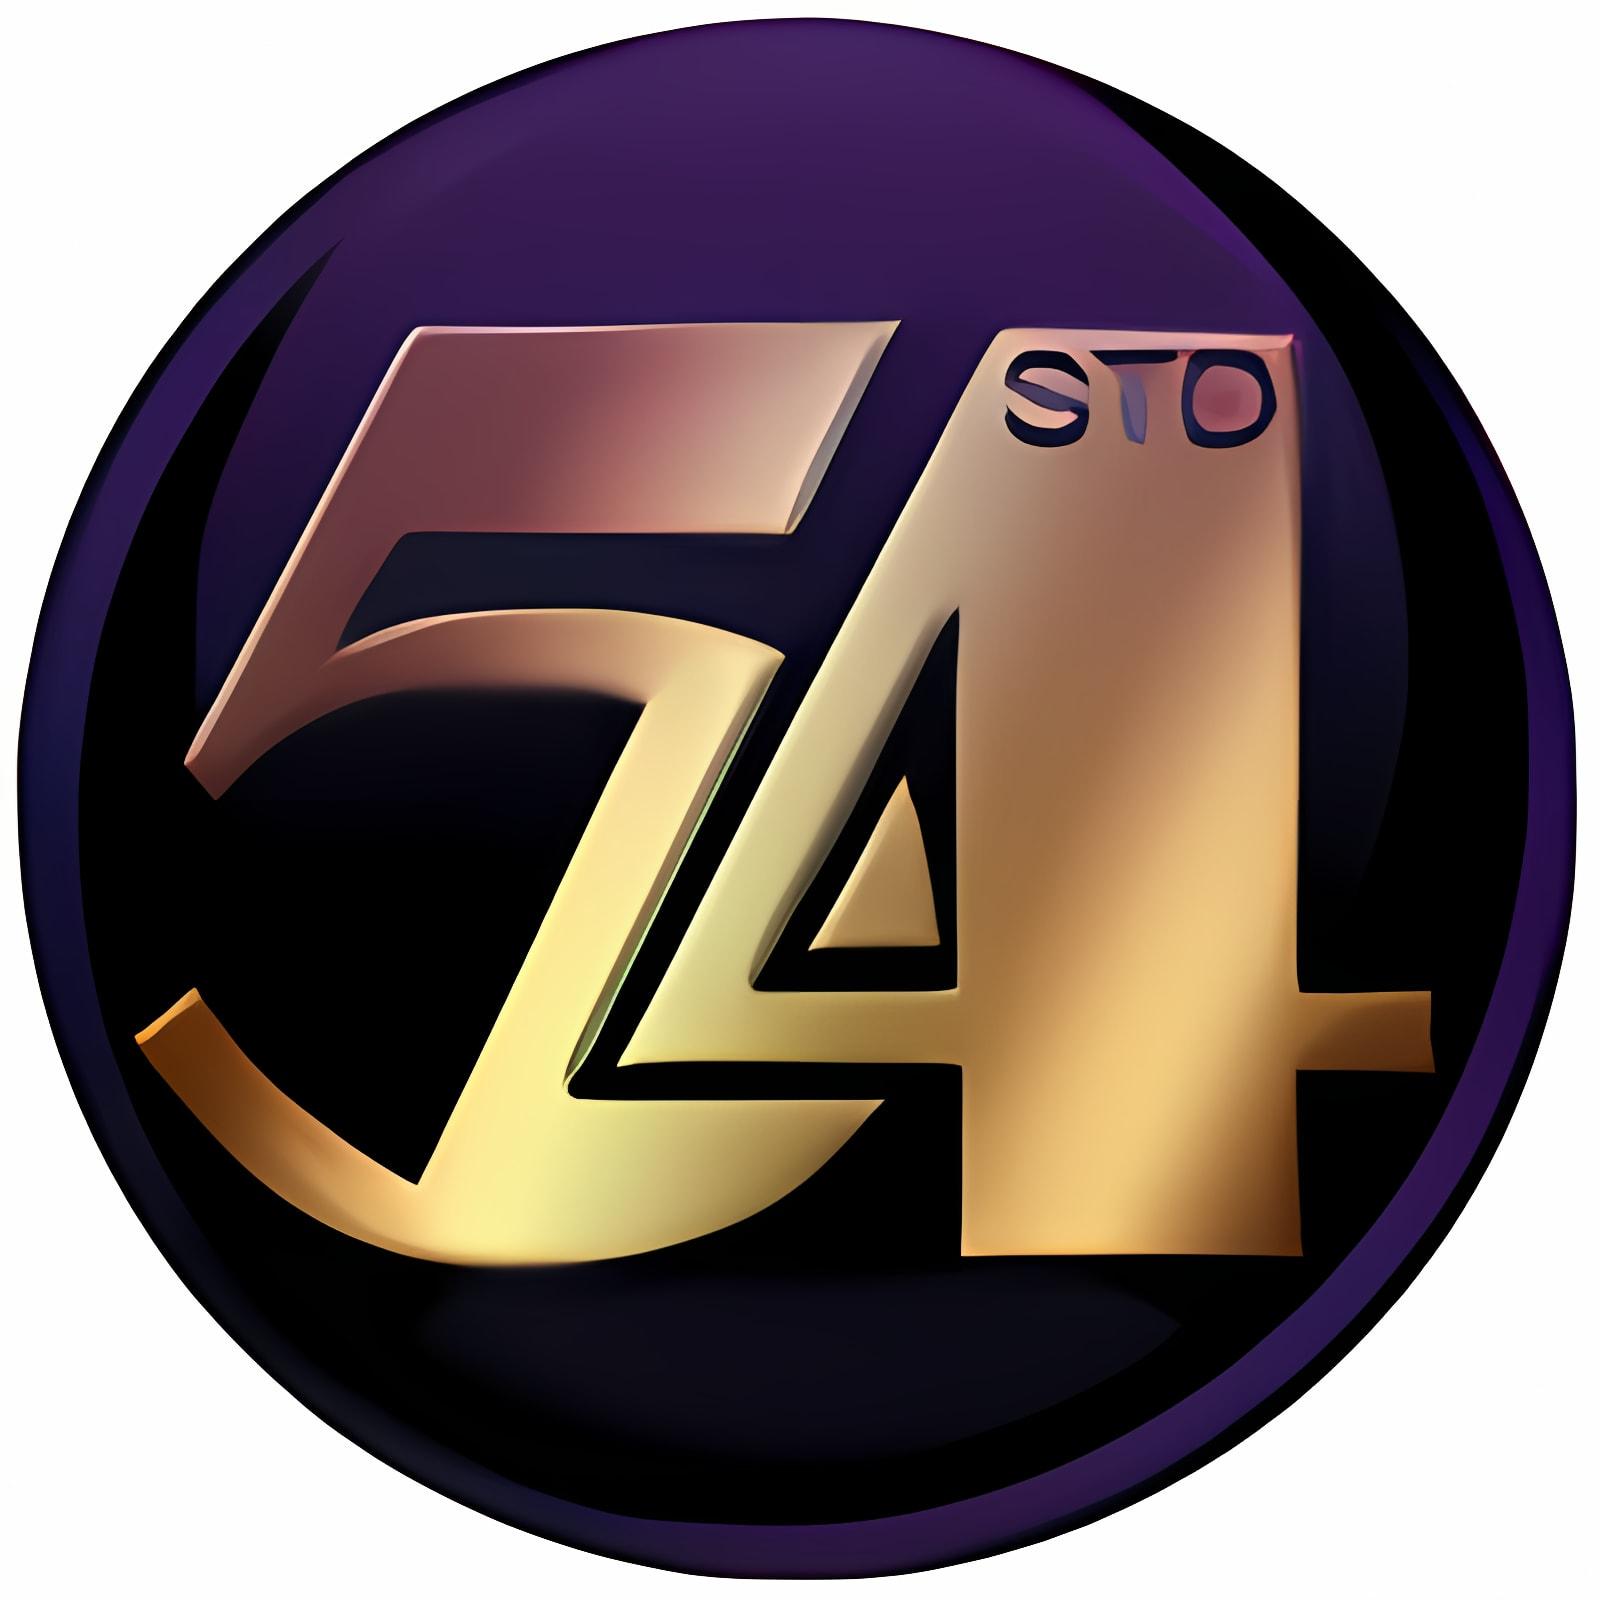 SPDJ Studio 54 Edition